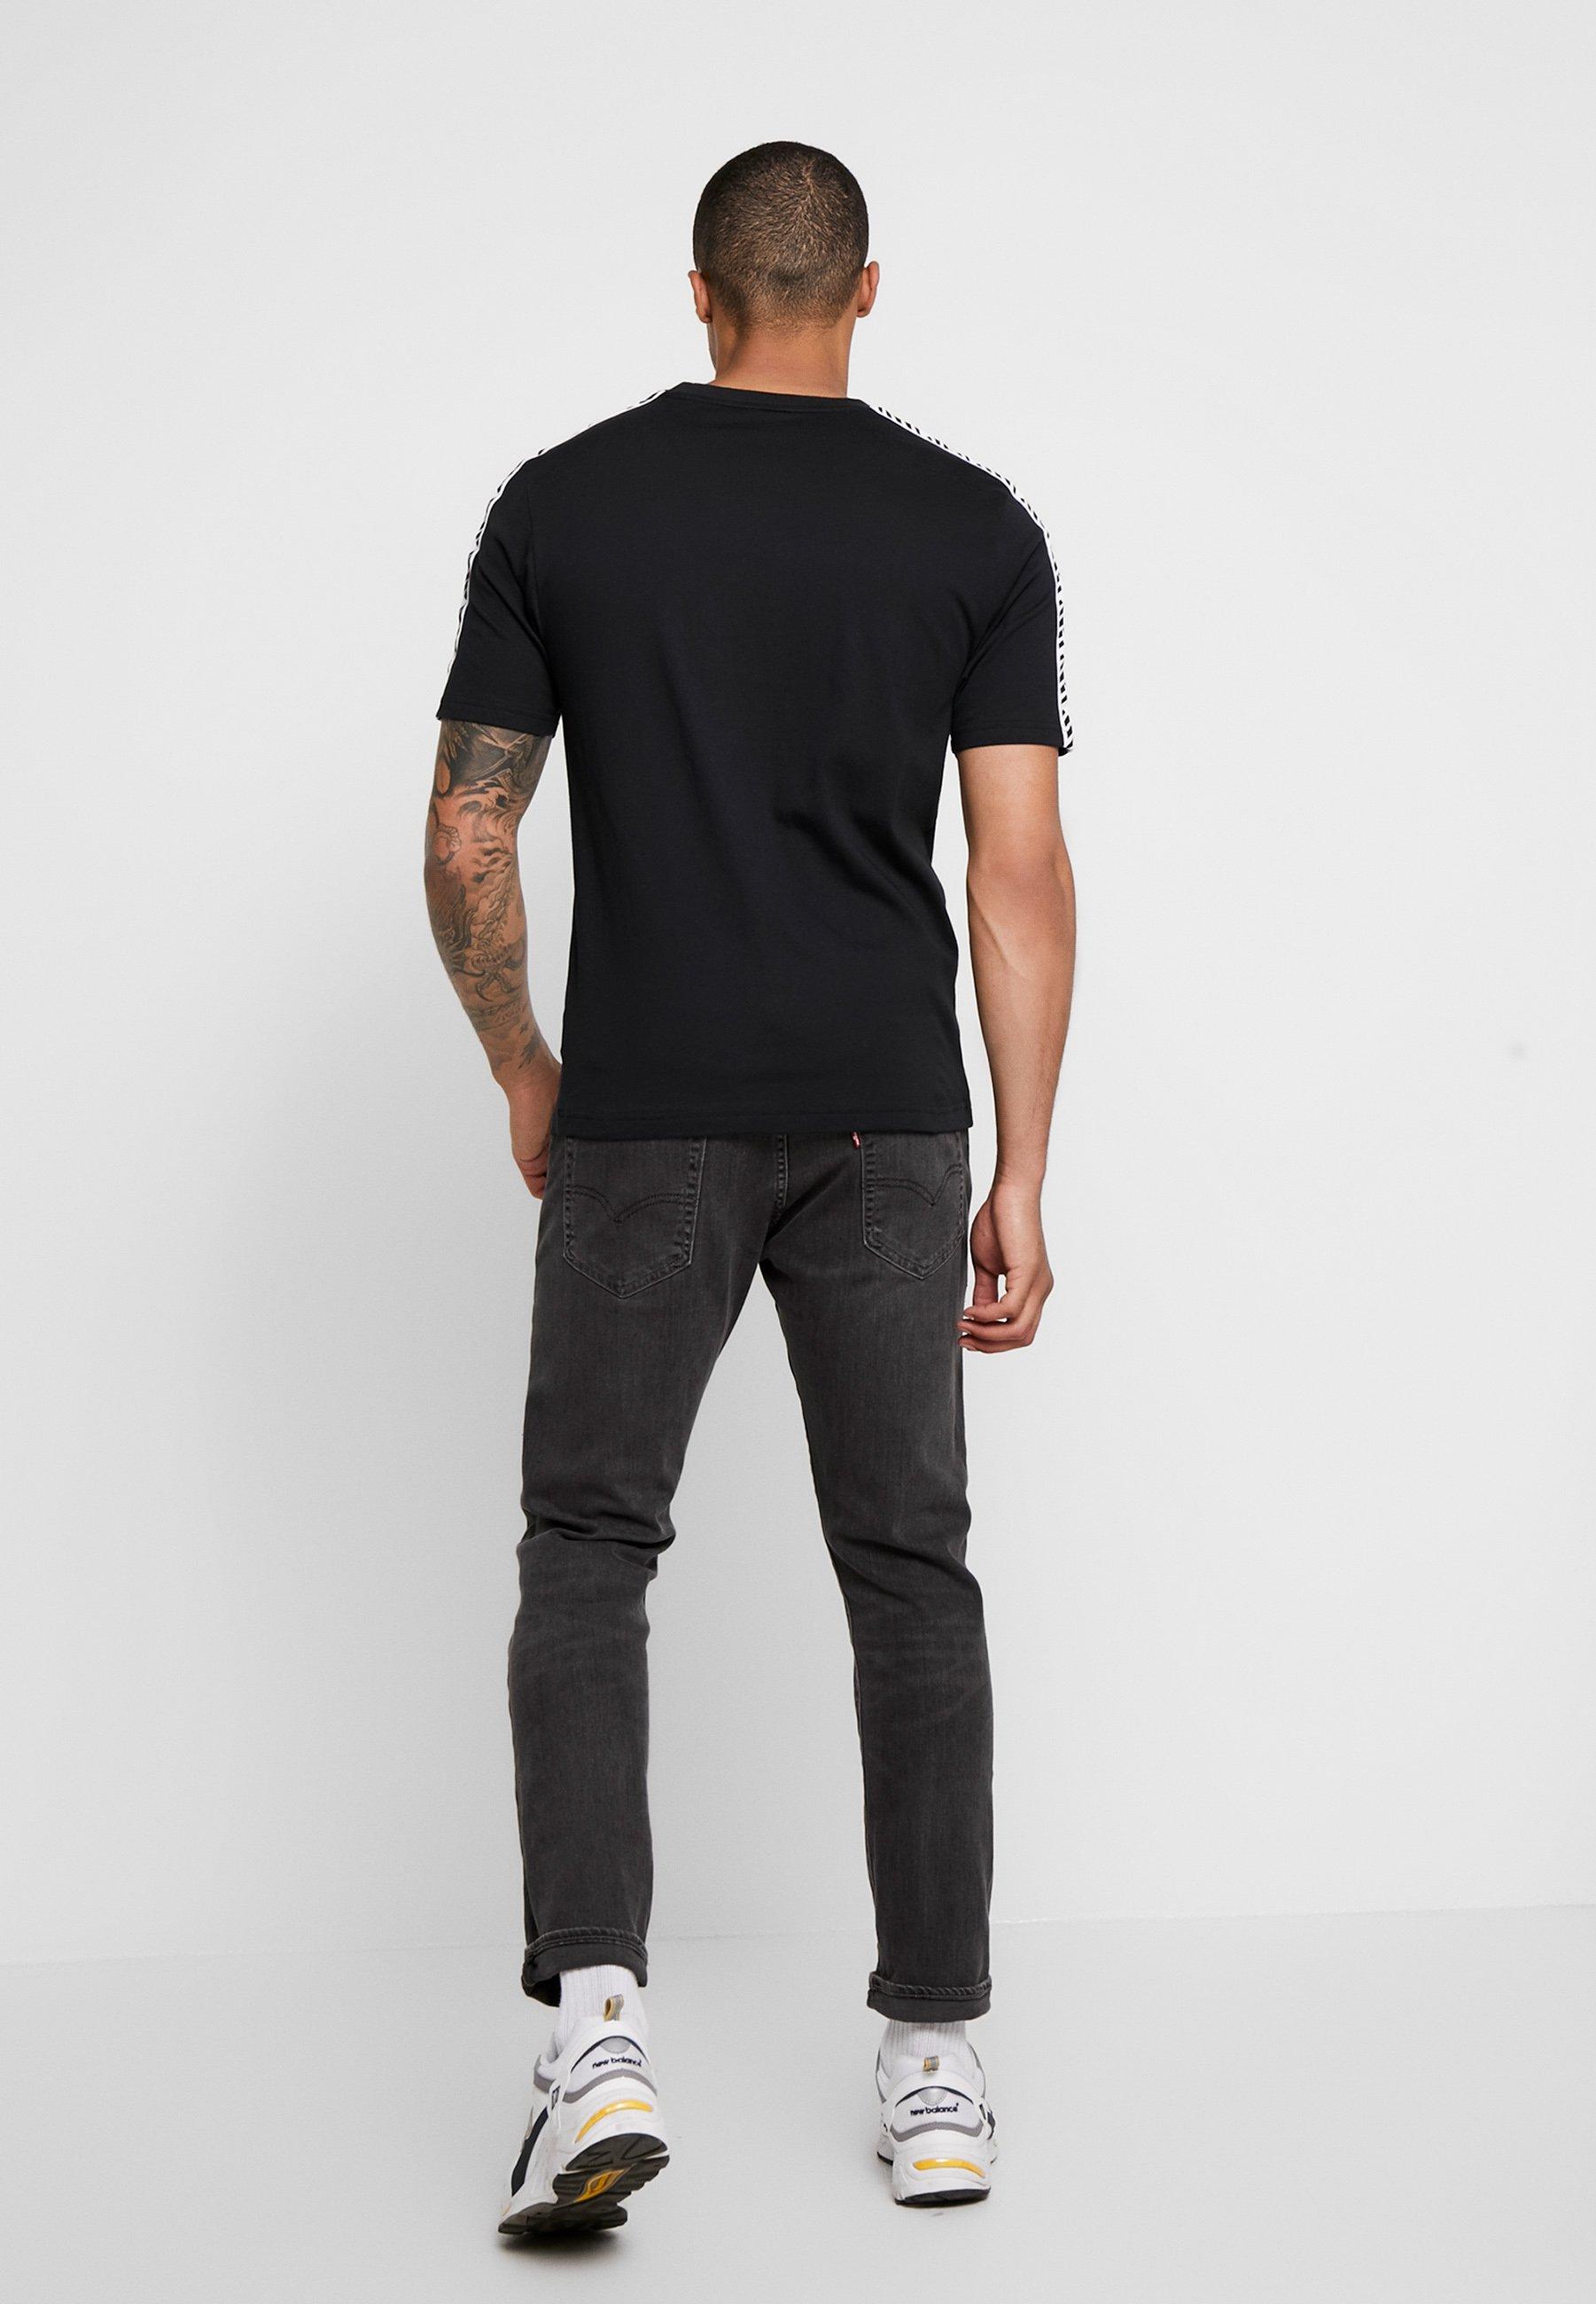 Black TrackT Balance Athletics New shirt Imprimé rthsdQC